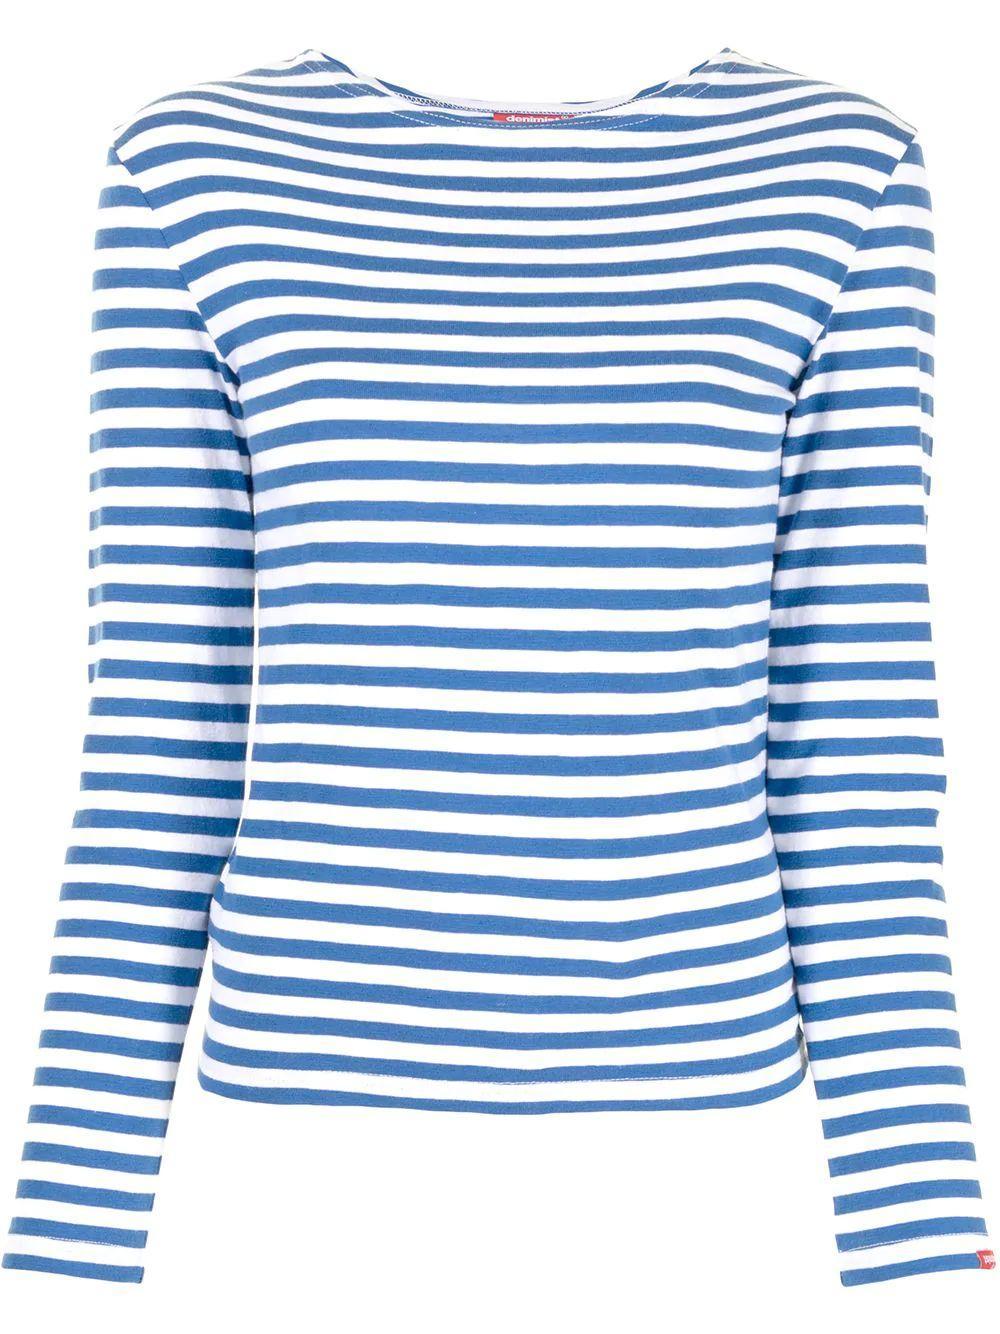 Striped Long Sleeve Tee Item # DSW4271-L04A